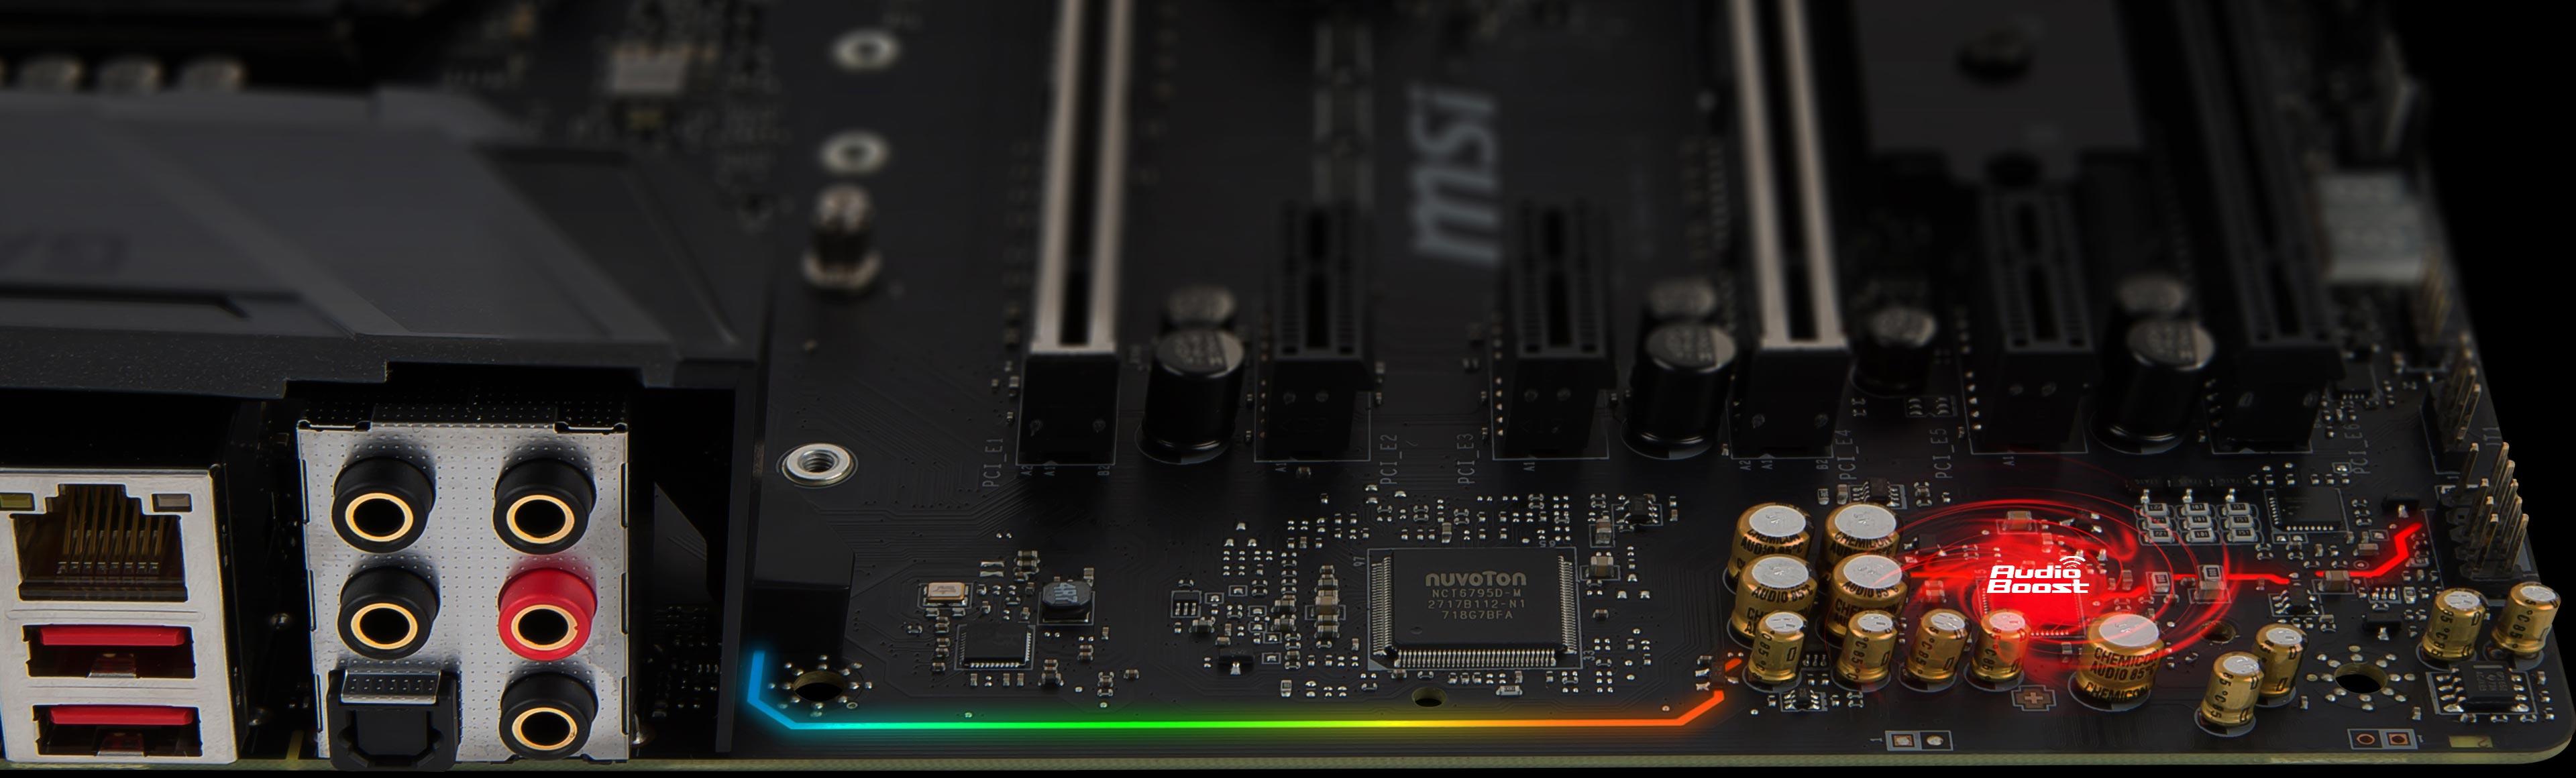 MSI Z370 GAMING M5 Enthusiast Intel Coffee Lake LGA 1151 Gaming Motherboard